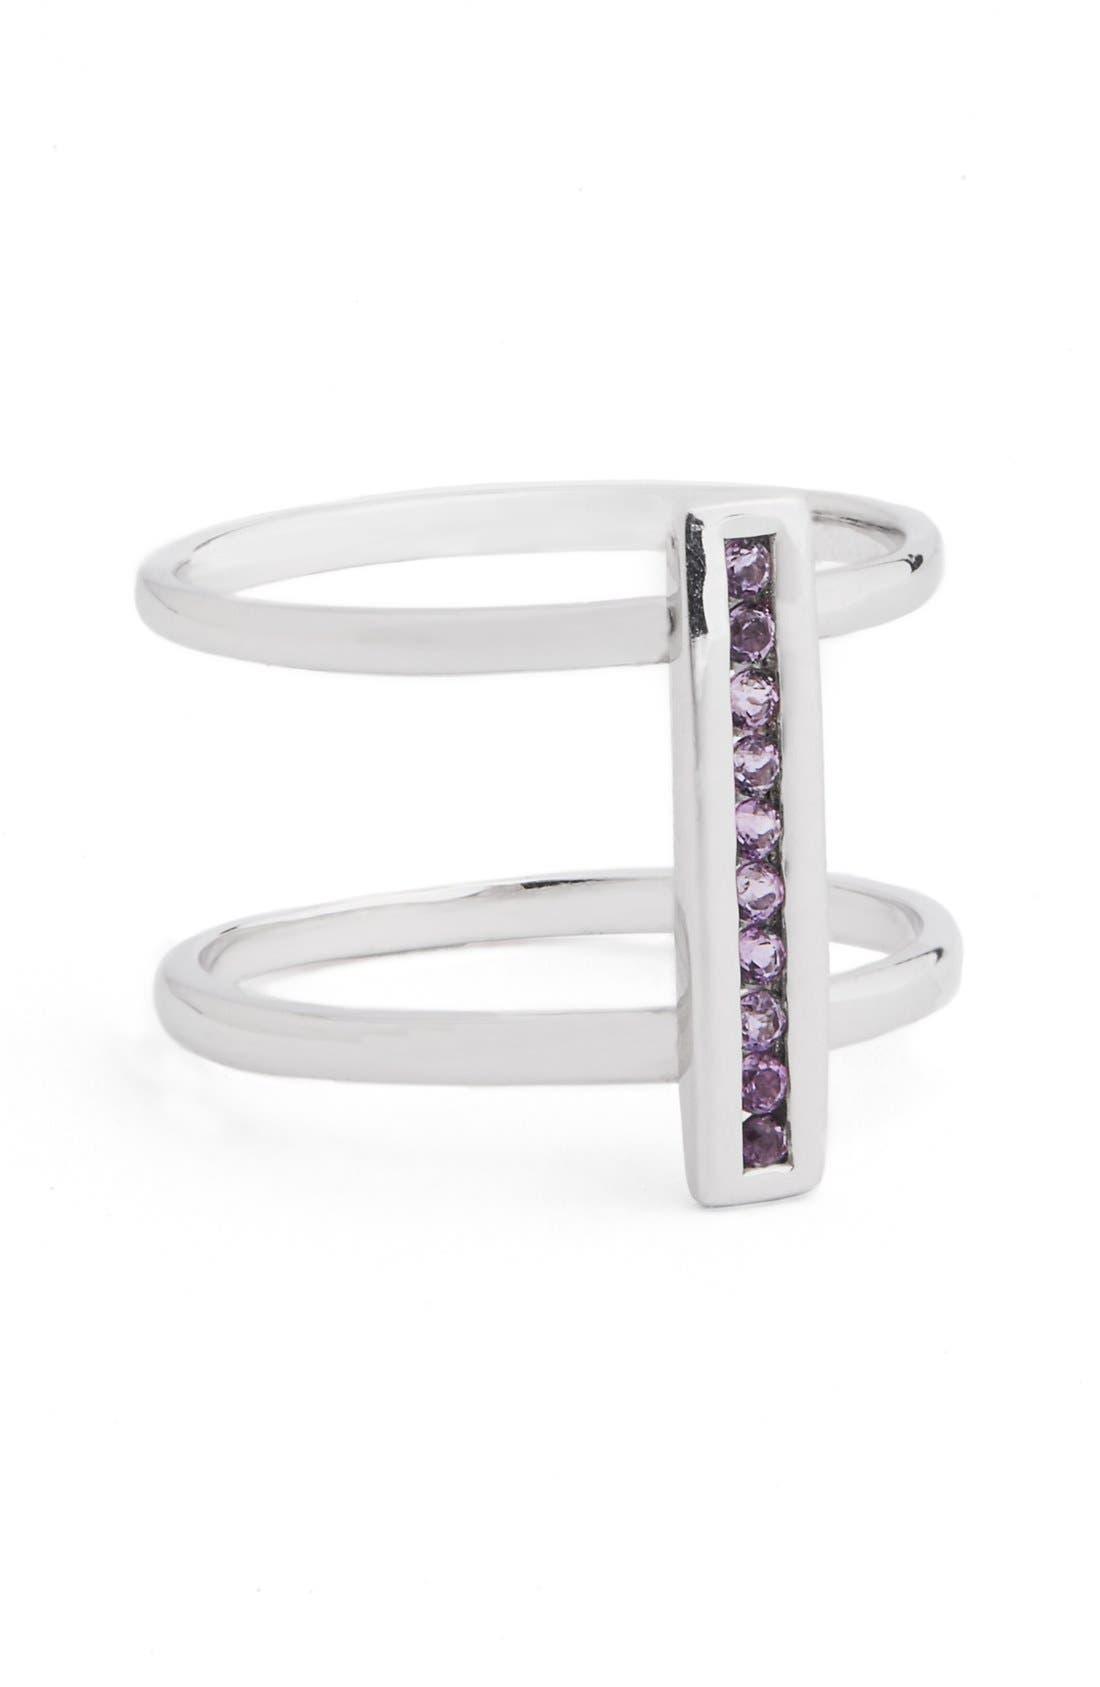 'Licol' LightAmethyst Bar Ring,                         Main,                         color, Silver Pink